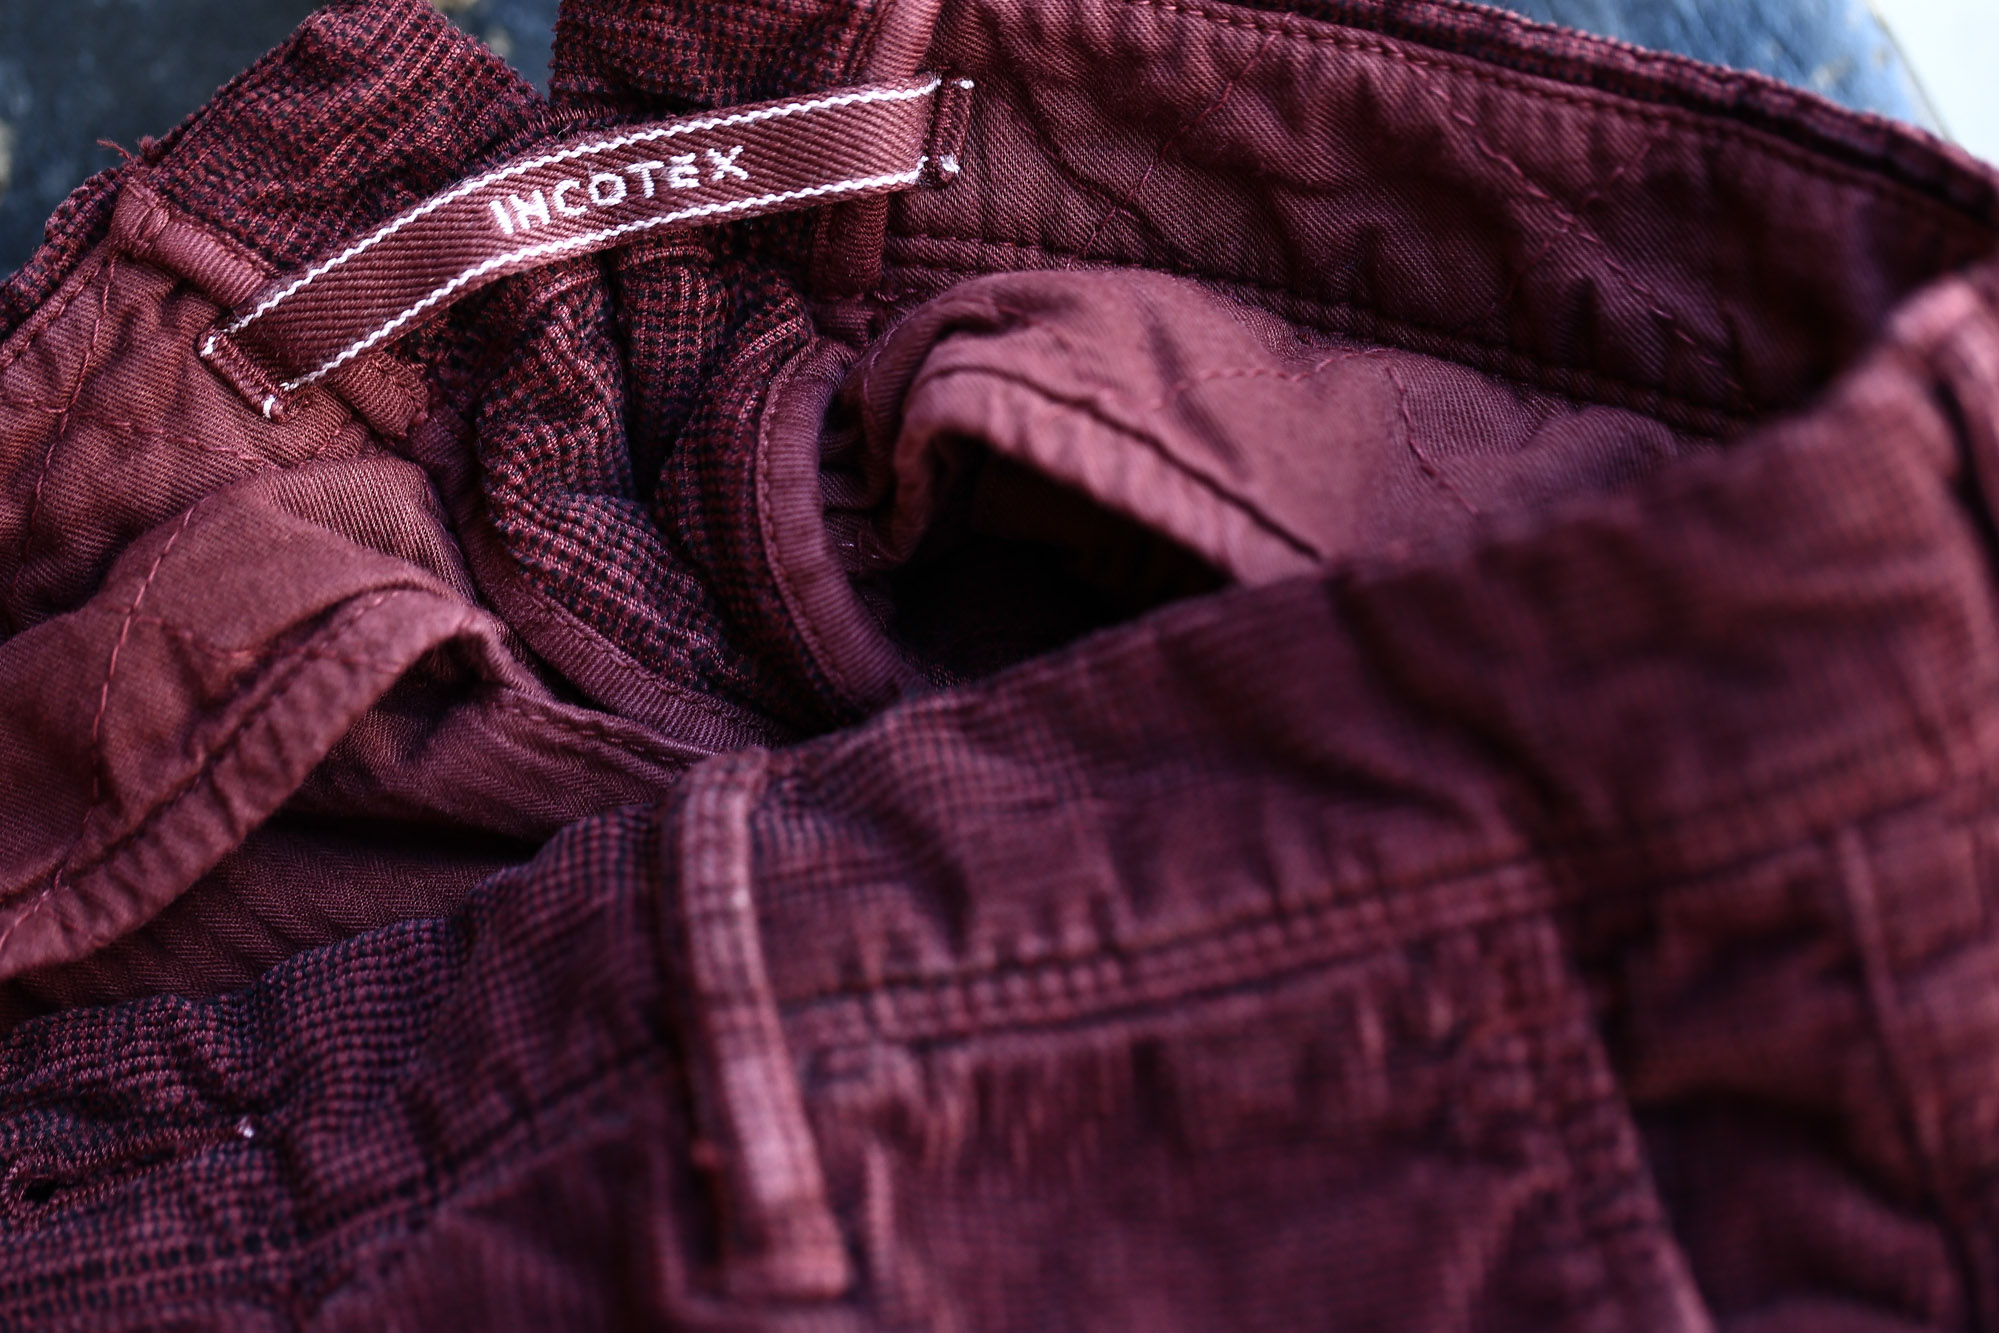 INCOTEX SLACKS(インコテックススラックス) 1ST603 SLIM FIT Garment Dyed Stretch Waffle ストレッチ ワッフルコーデュロイ パンツ BORDEAUX (ボルドー・226) 2016 秋冬新作 の画像。バーガンディー 愛知 名古屋 Alto e Diritto アルト エ デリット 入荷。